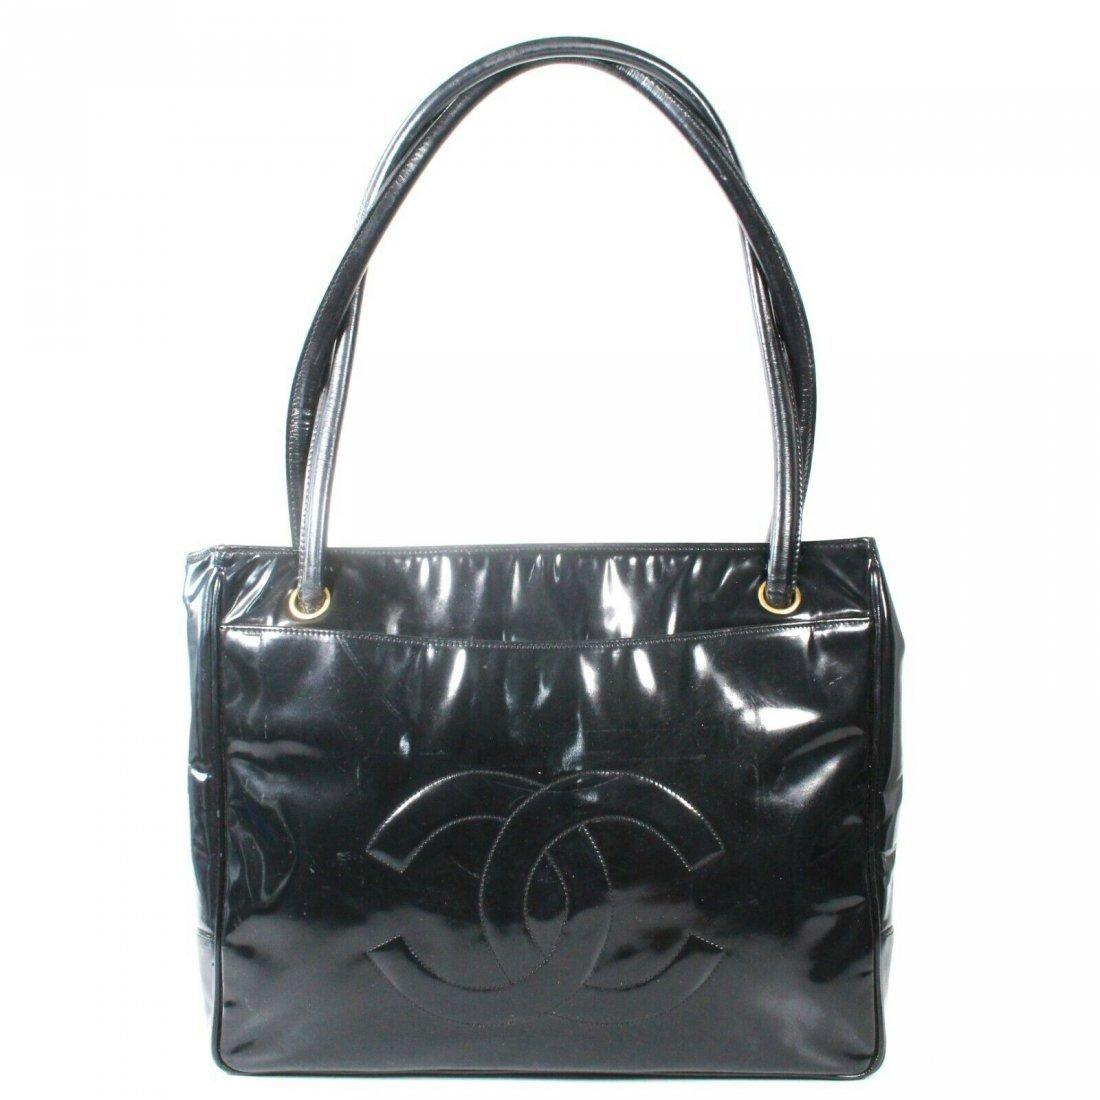 Chanel - Vintage CC Tote Bag - Patent Leather - Medium